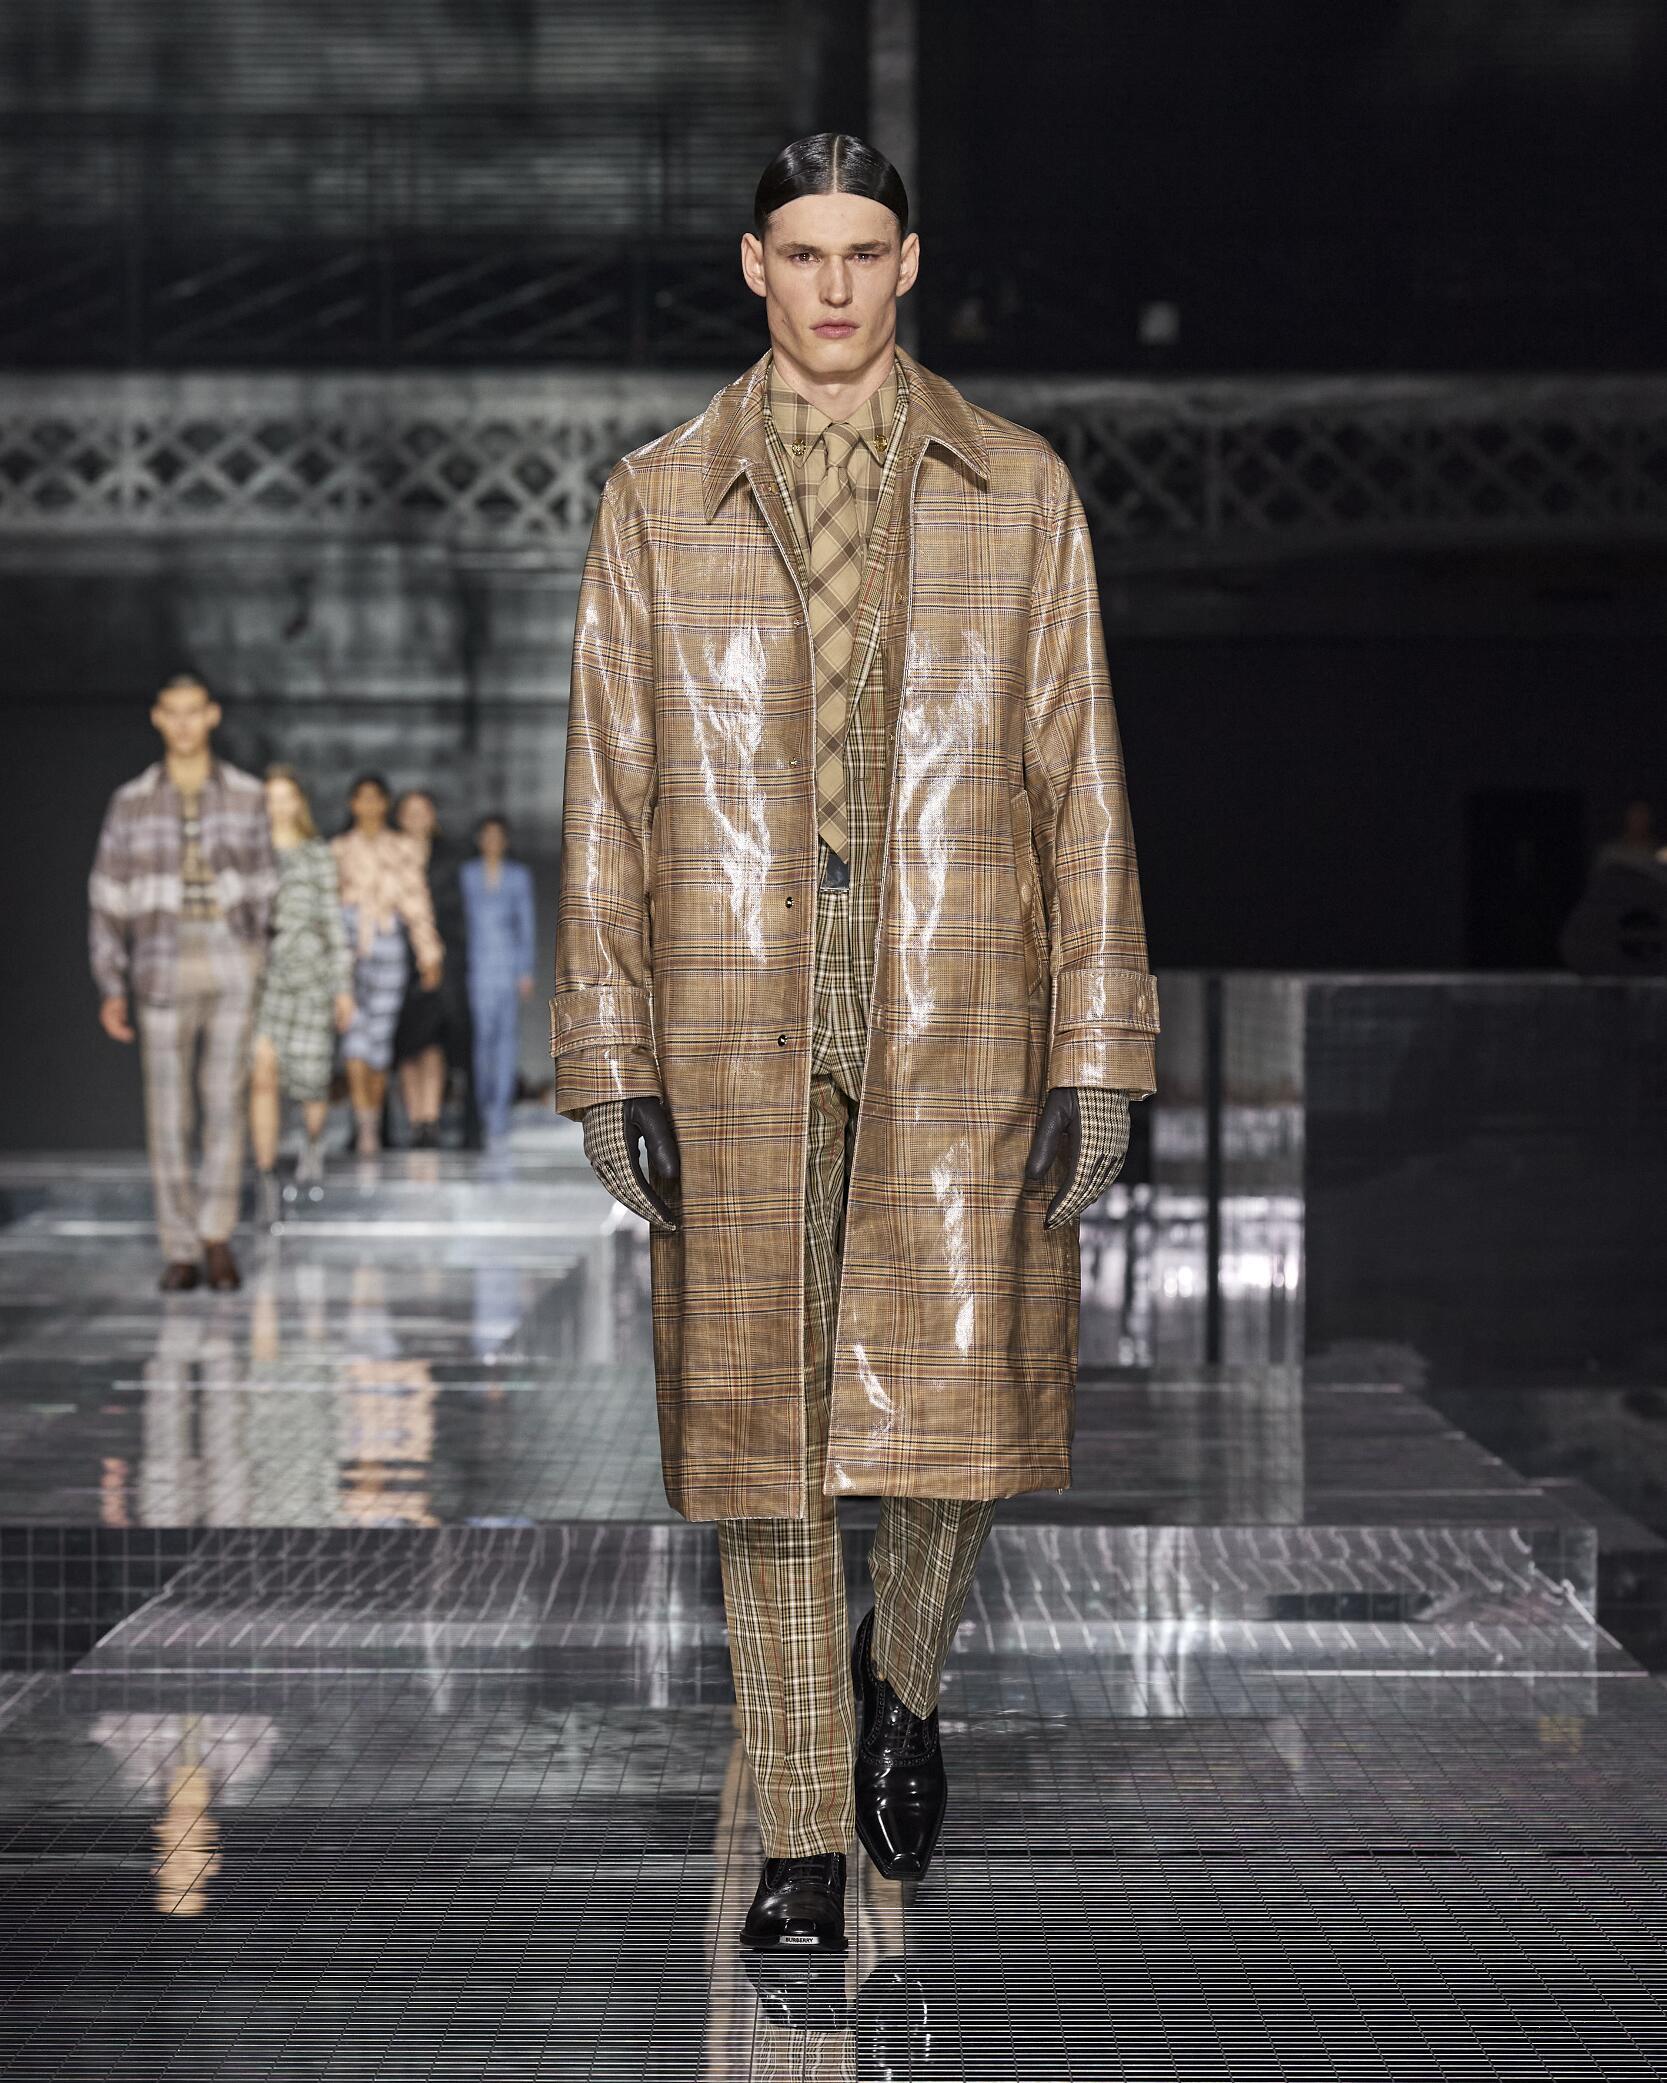 Fashion Show Man Model Burberry Catwalk